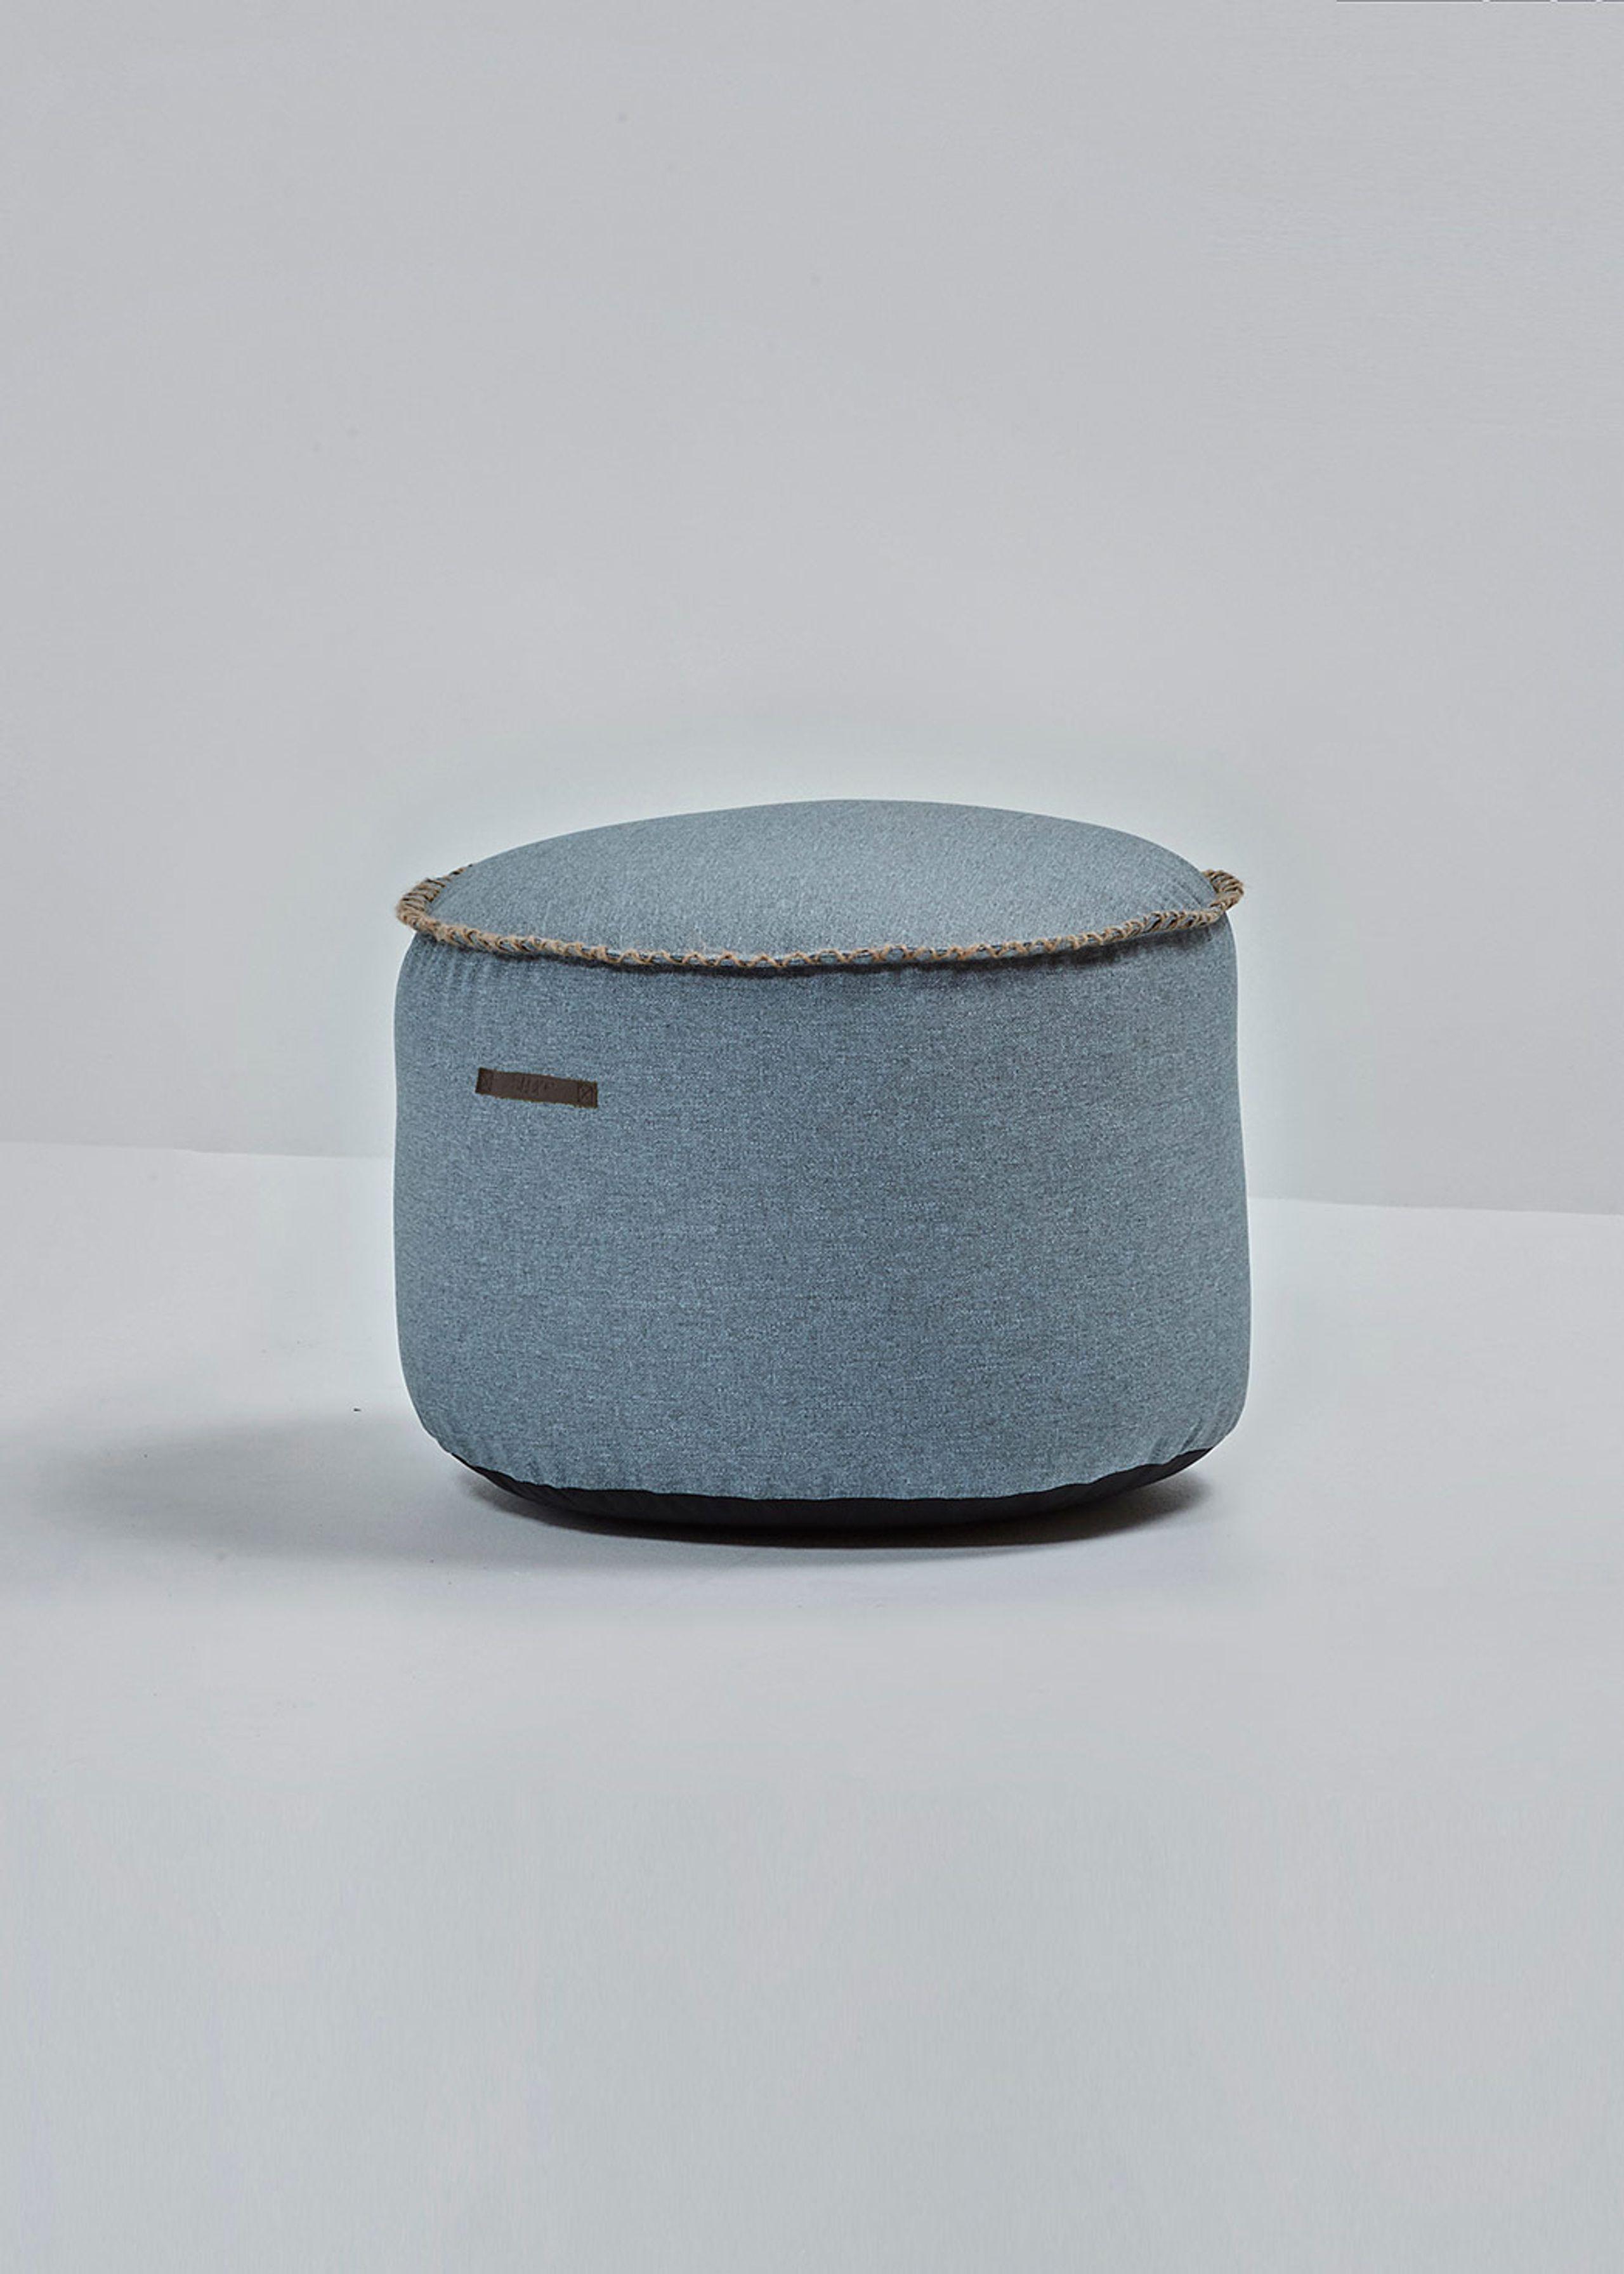 Image of   RETROit Medley Drum / Luksus puf